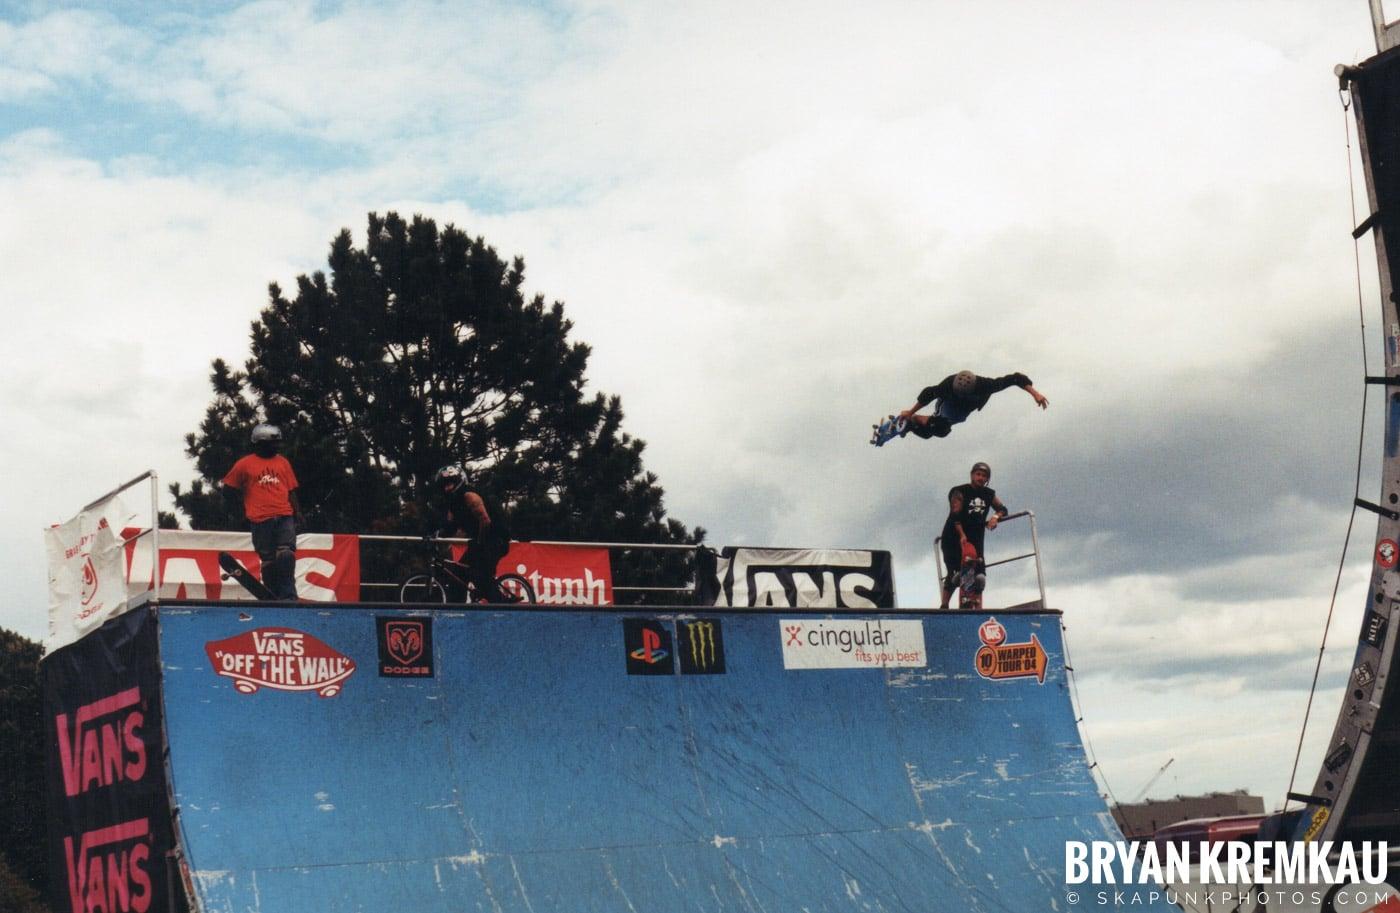 Skaters @ Vans Warped Tour, Randall's Island, NYC - 8.7.04 (6)